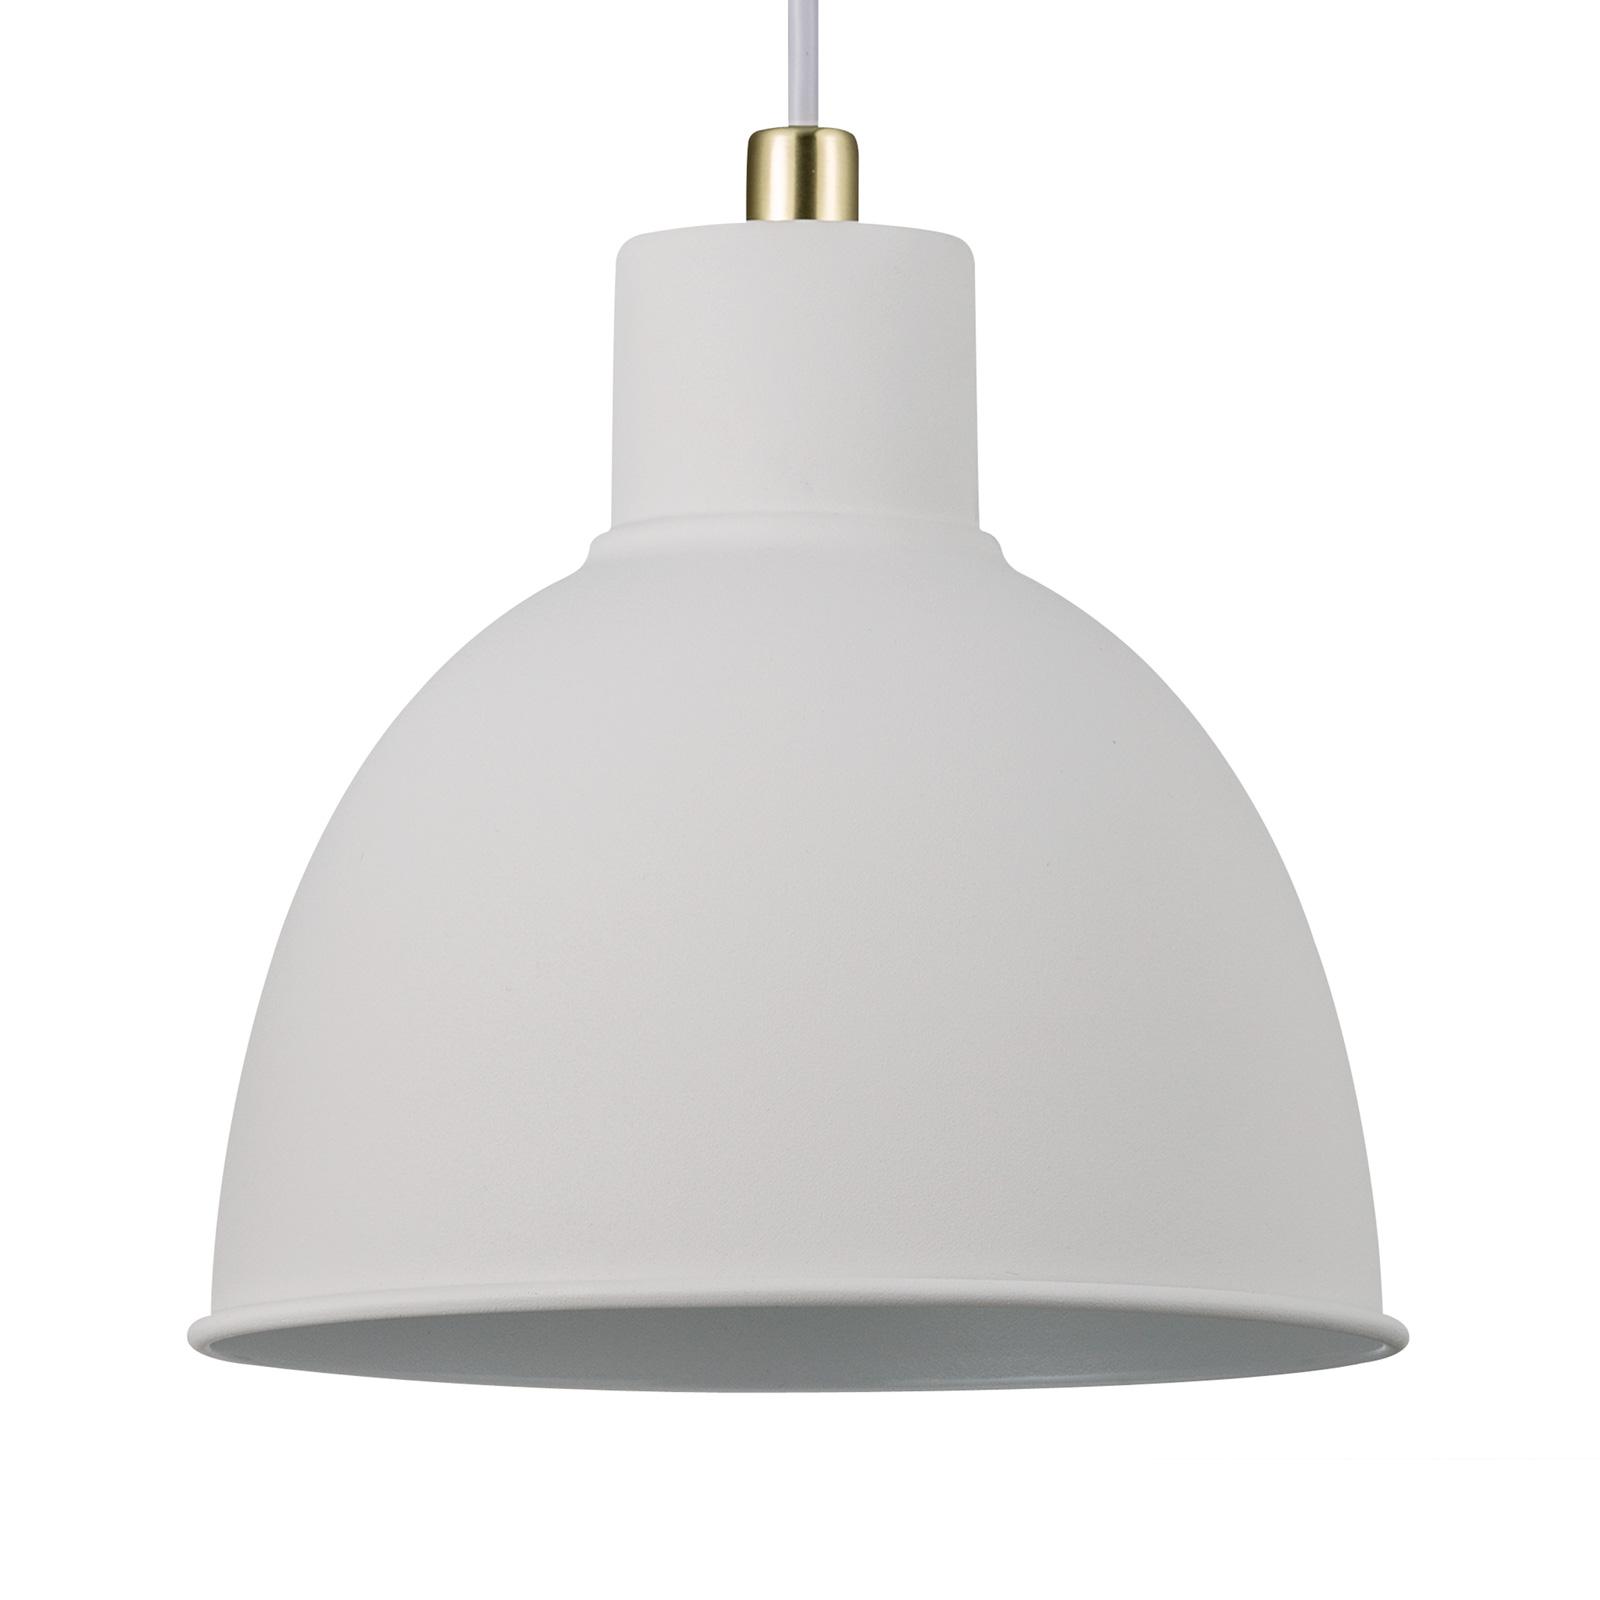 Lampa wisząca Pop Rough z metalu, biała